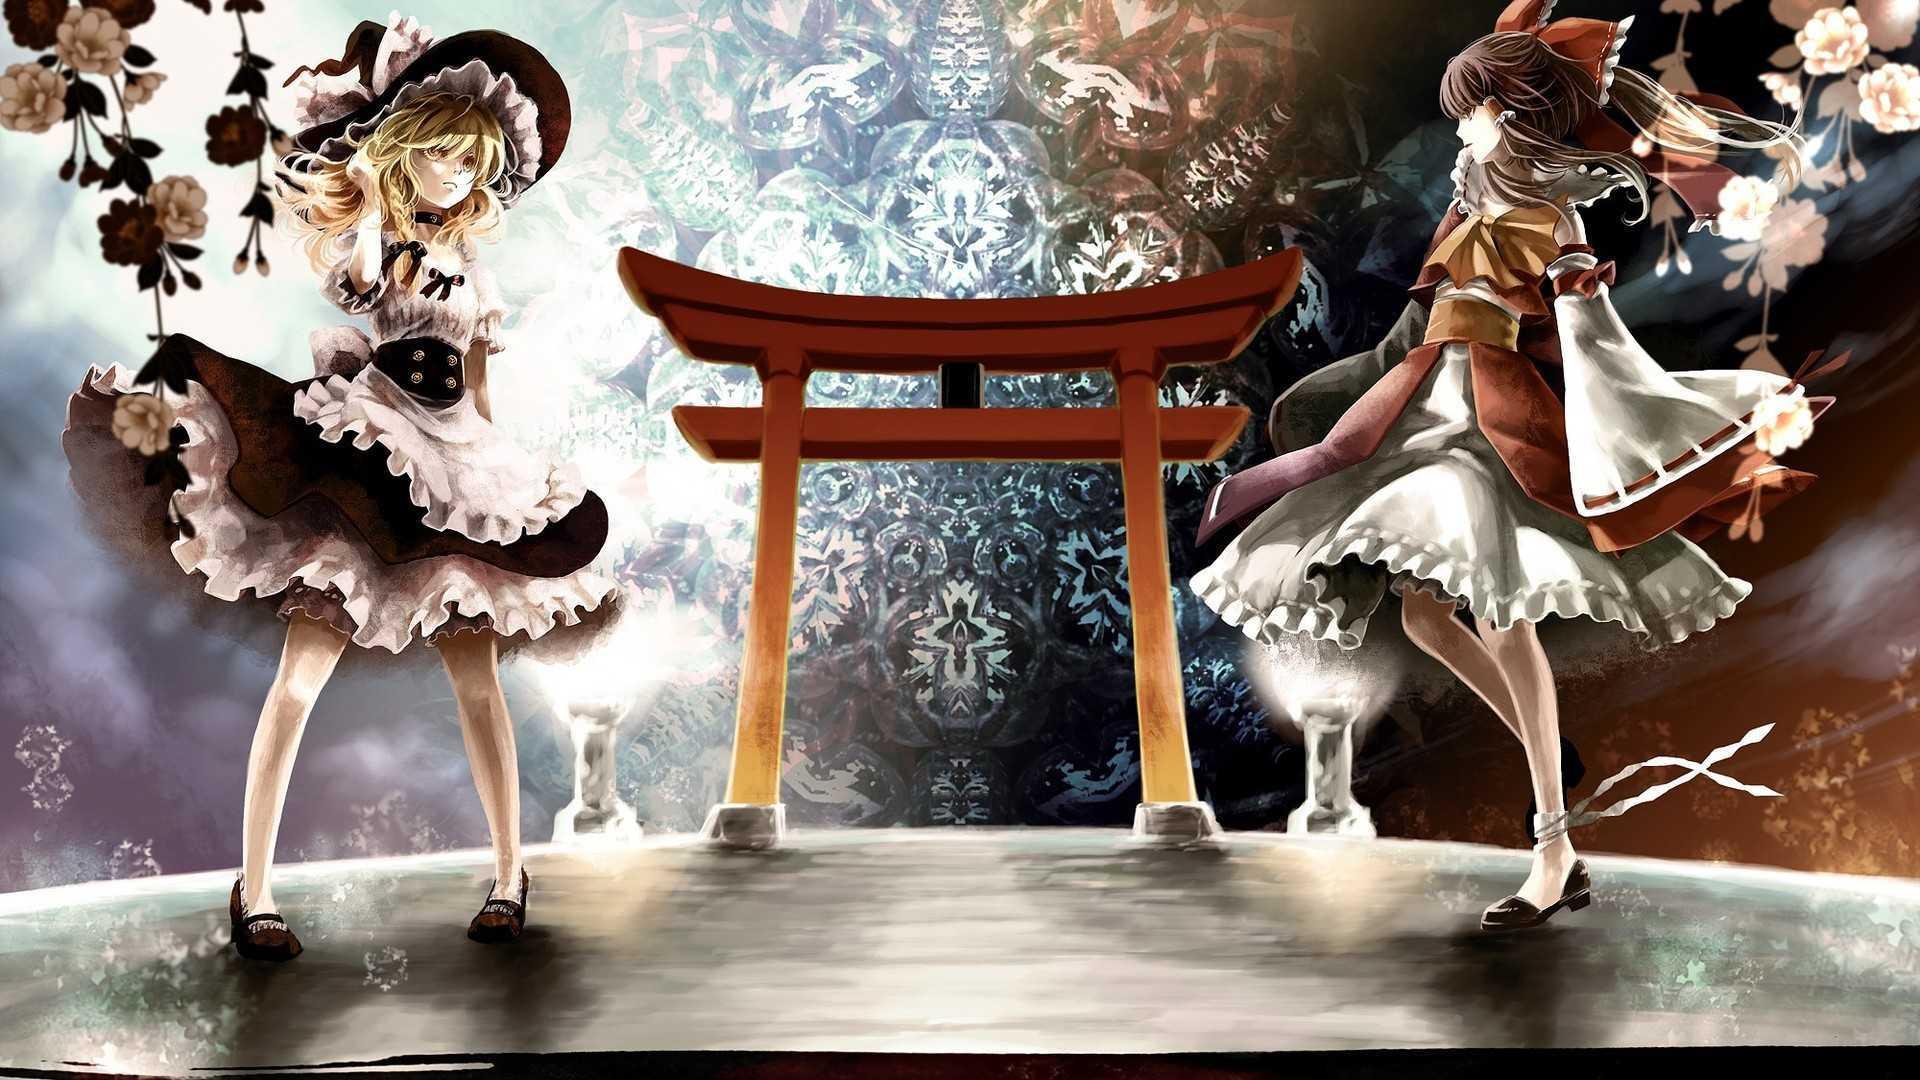 Touhou Animated Wallpaper Hd